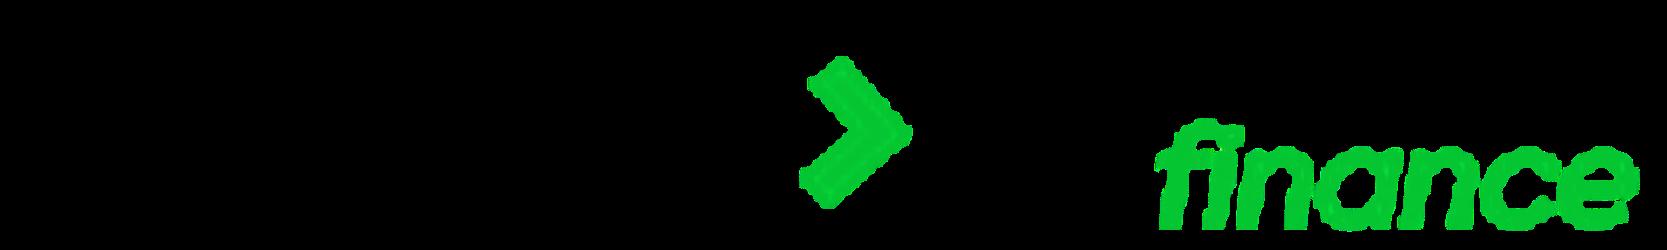 Cash-U логотип